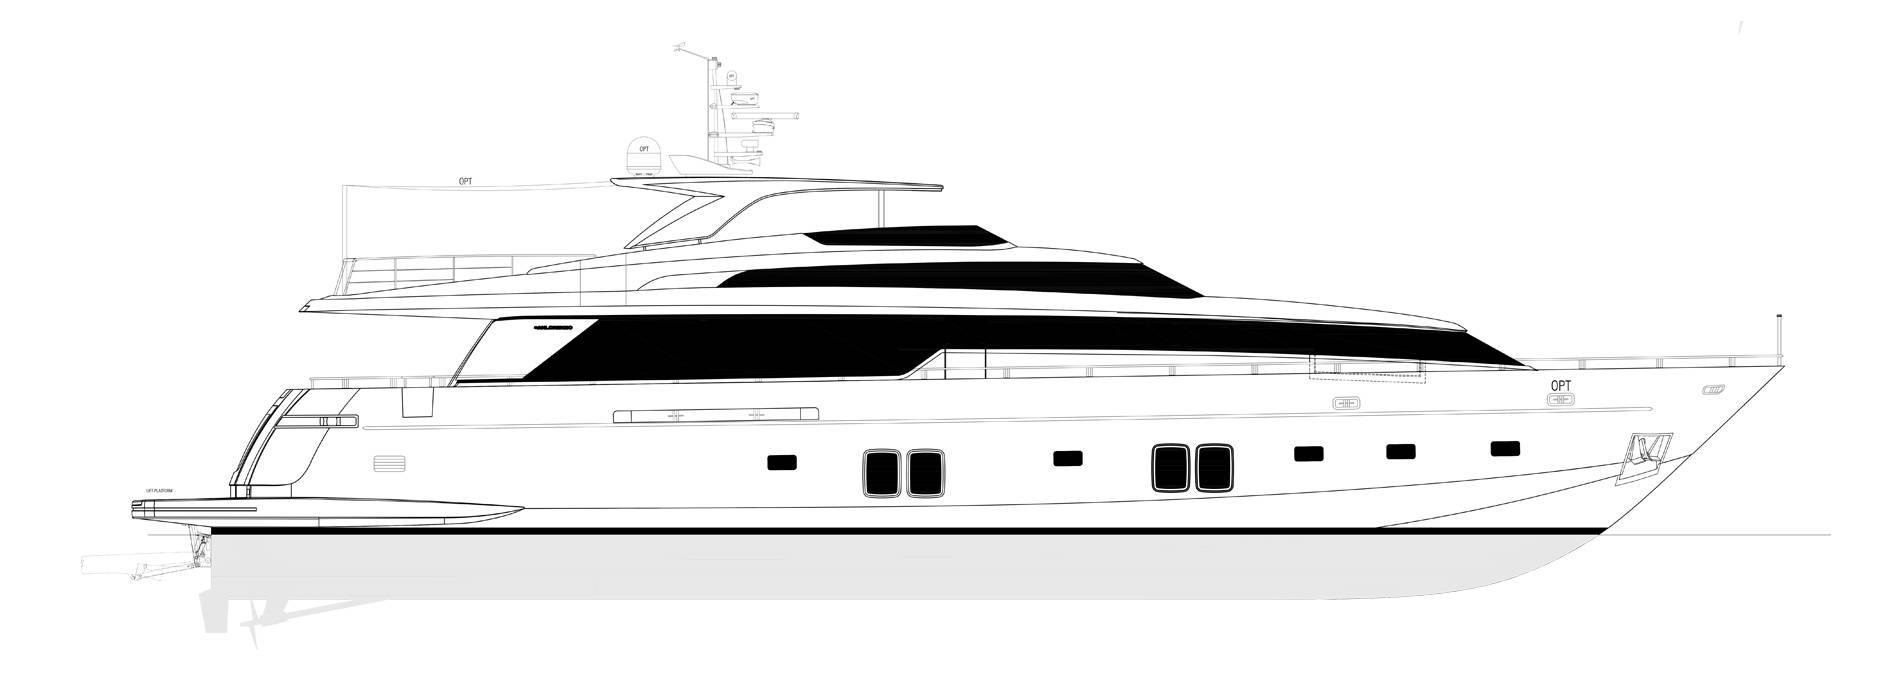 Sanlorenzo Yachts SL106-725 Perfil